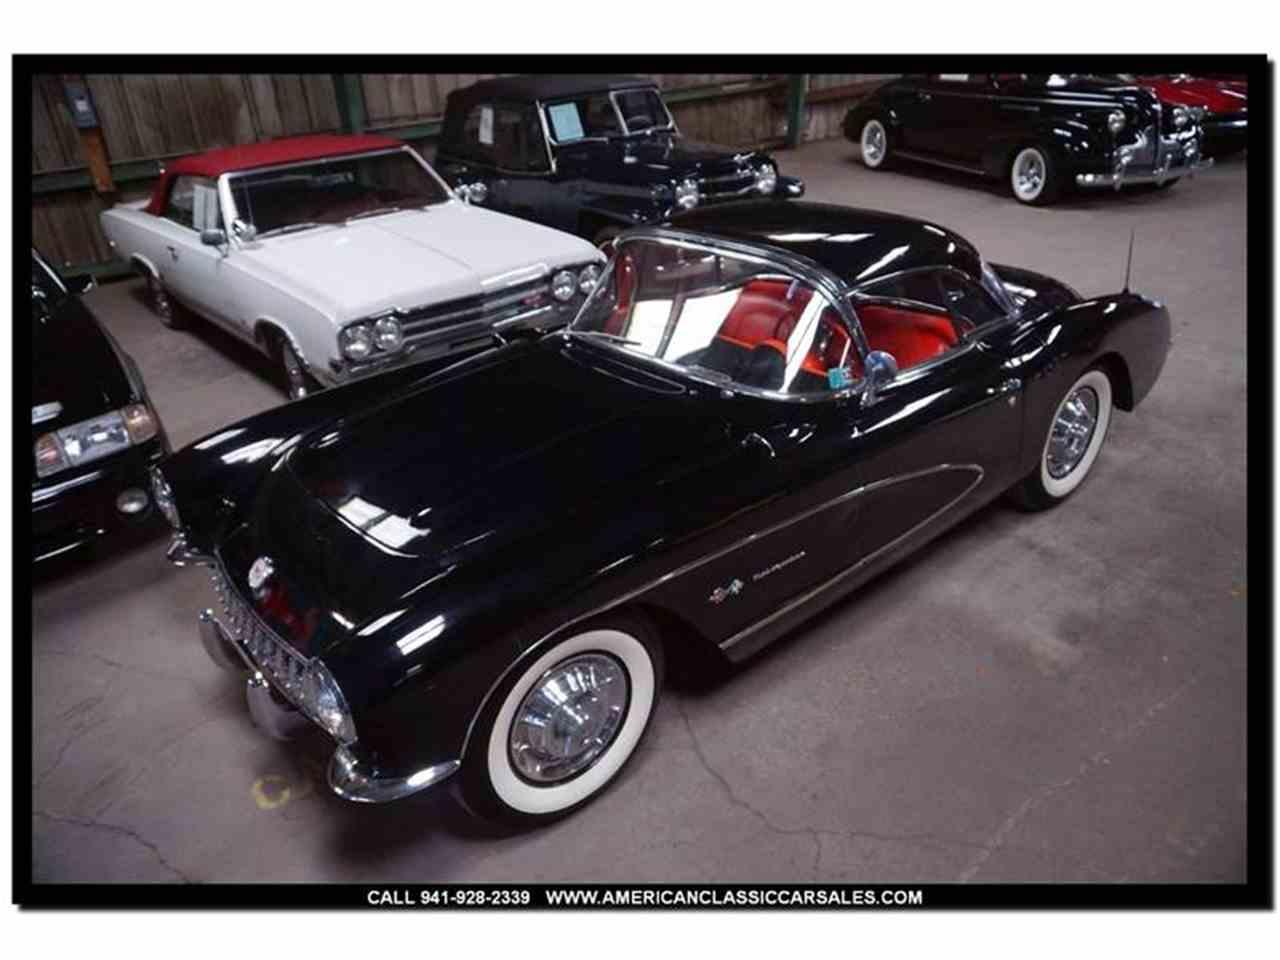 1957 chevrolet corvette for sale on classiccars com 31 - Photo 3